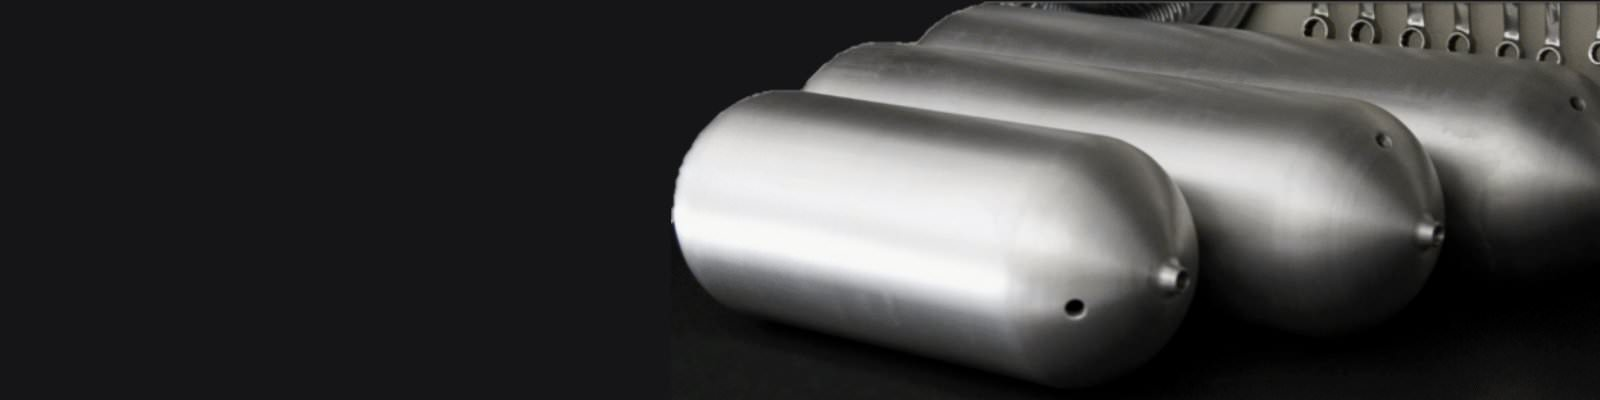 Seamless Aluminum Air Tanks